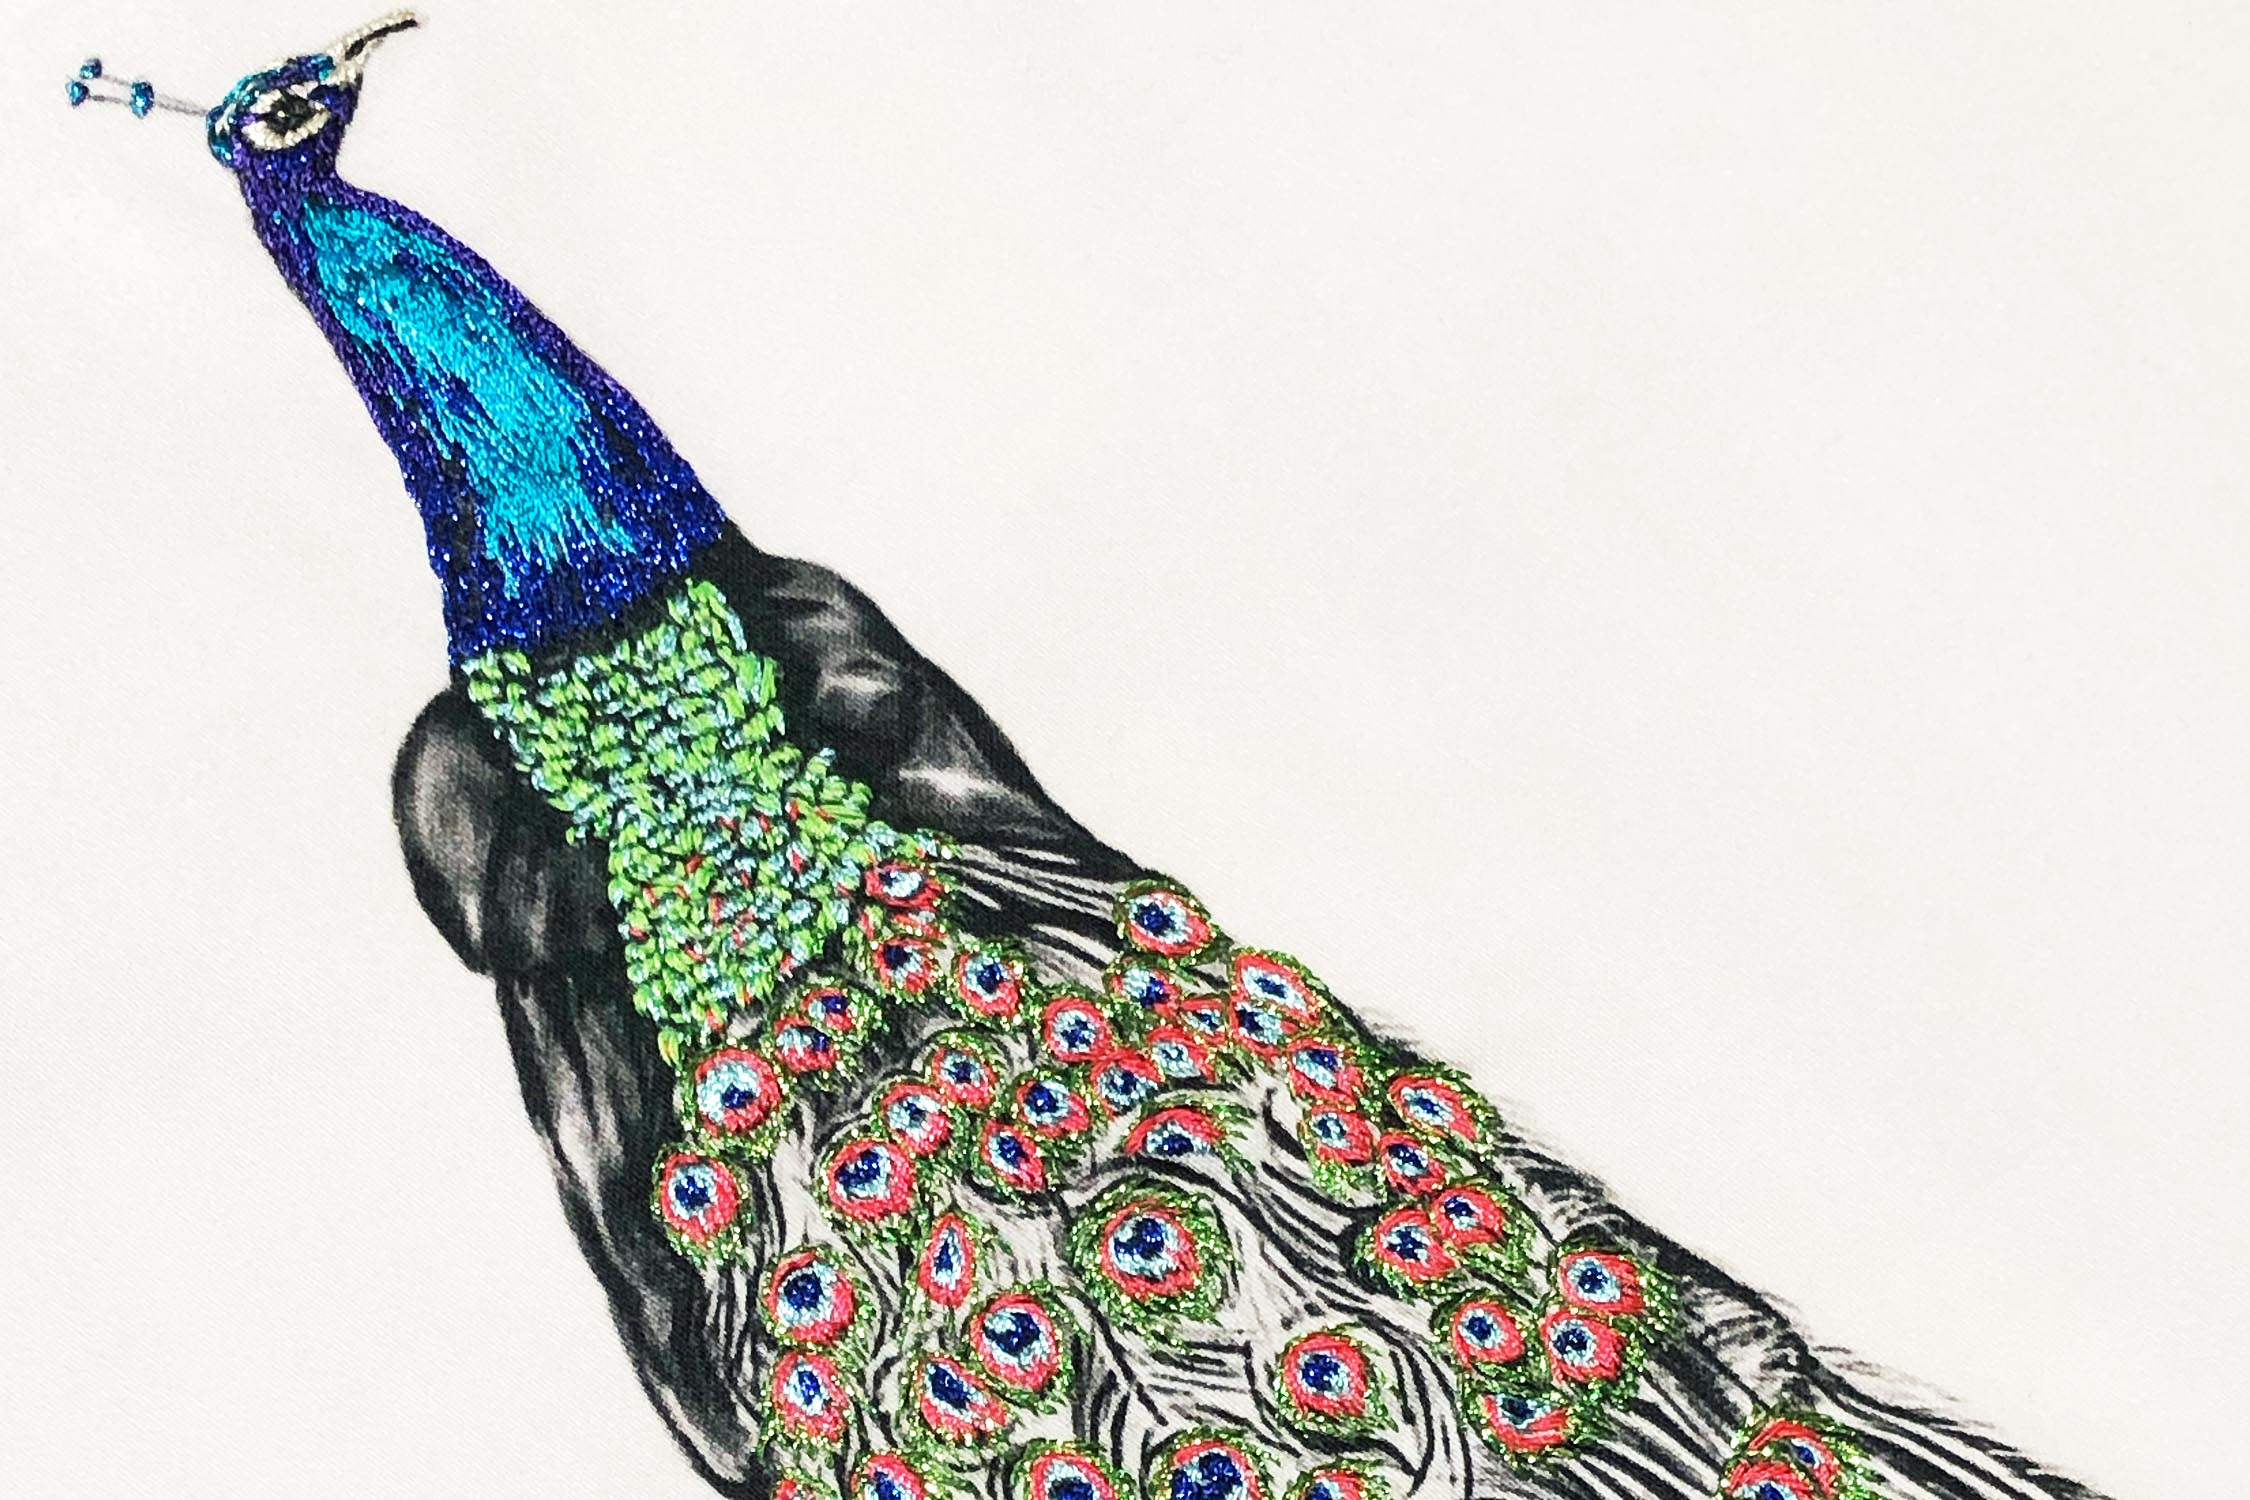 Decorex-embroidered-peacock.jpg